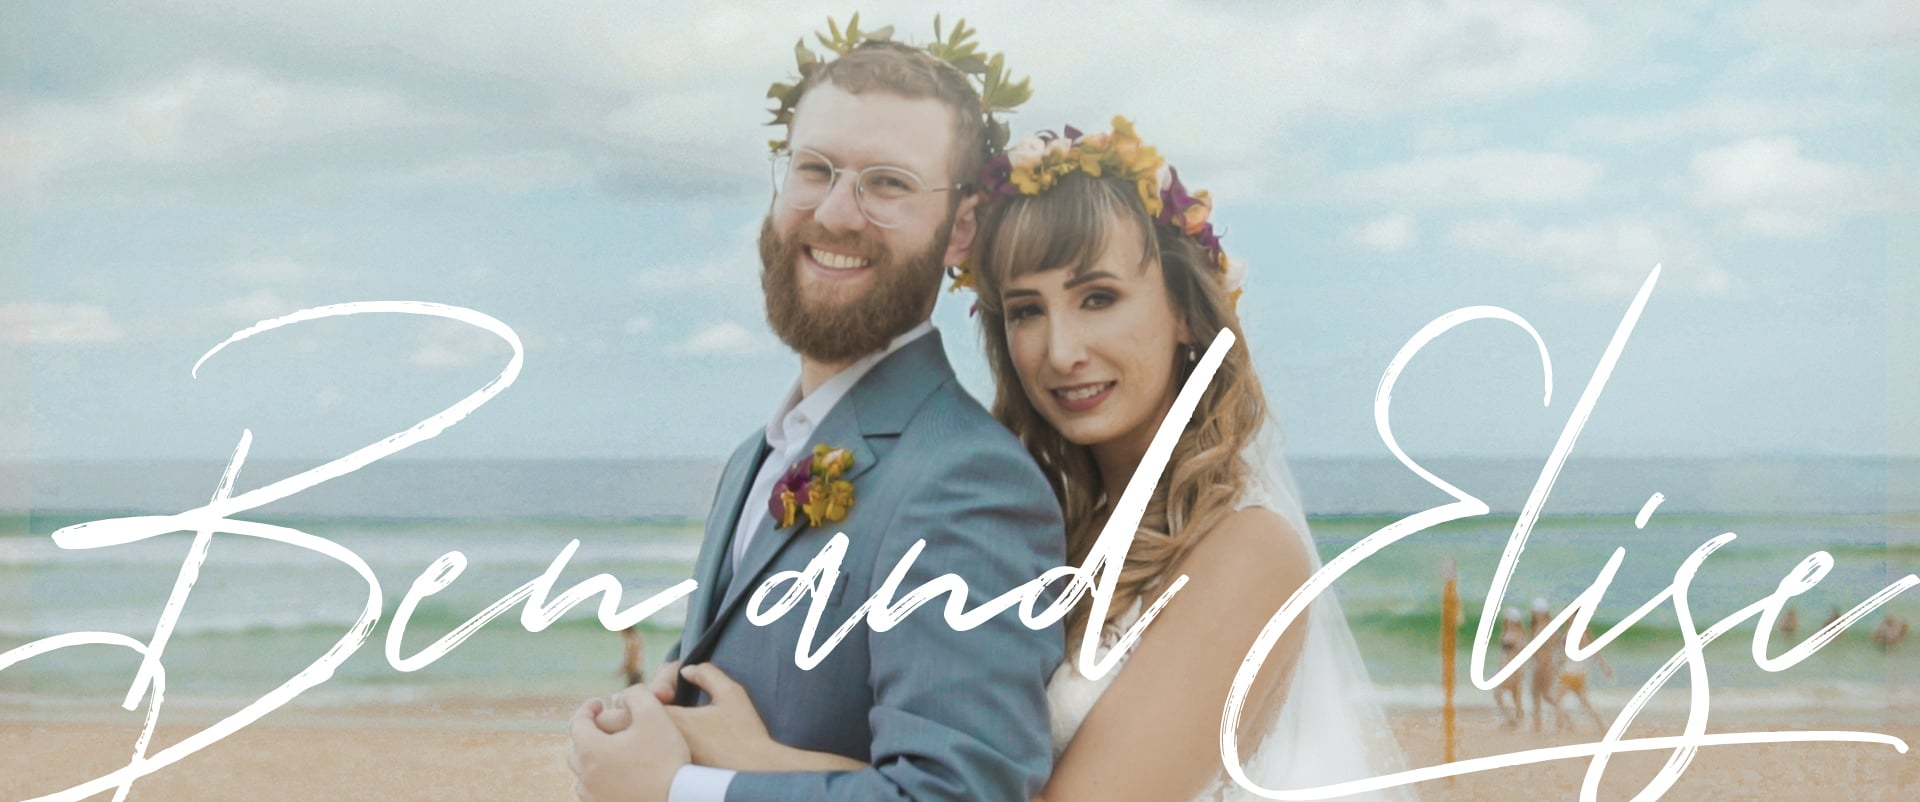 Elise ♥ Ben | Wedding Maresias Beach/SP - Luai Cabanas